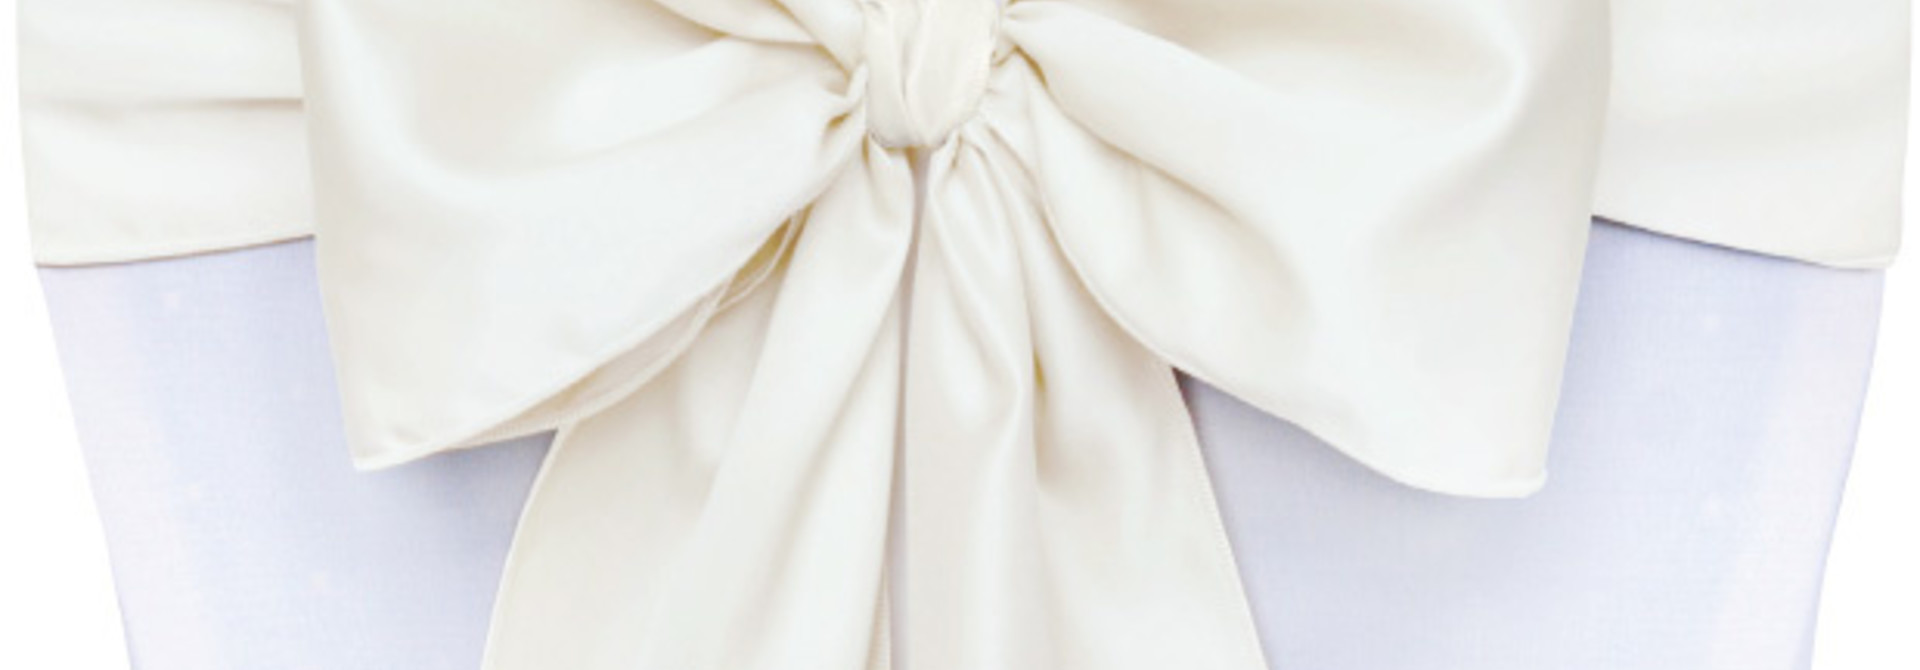 Stoellint de Lux cream (10st)